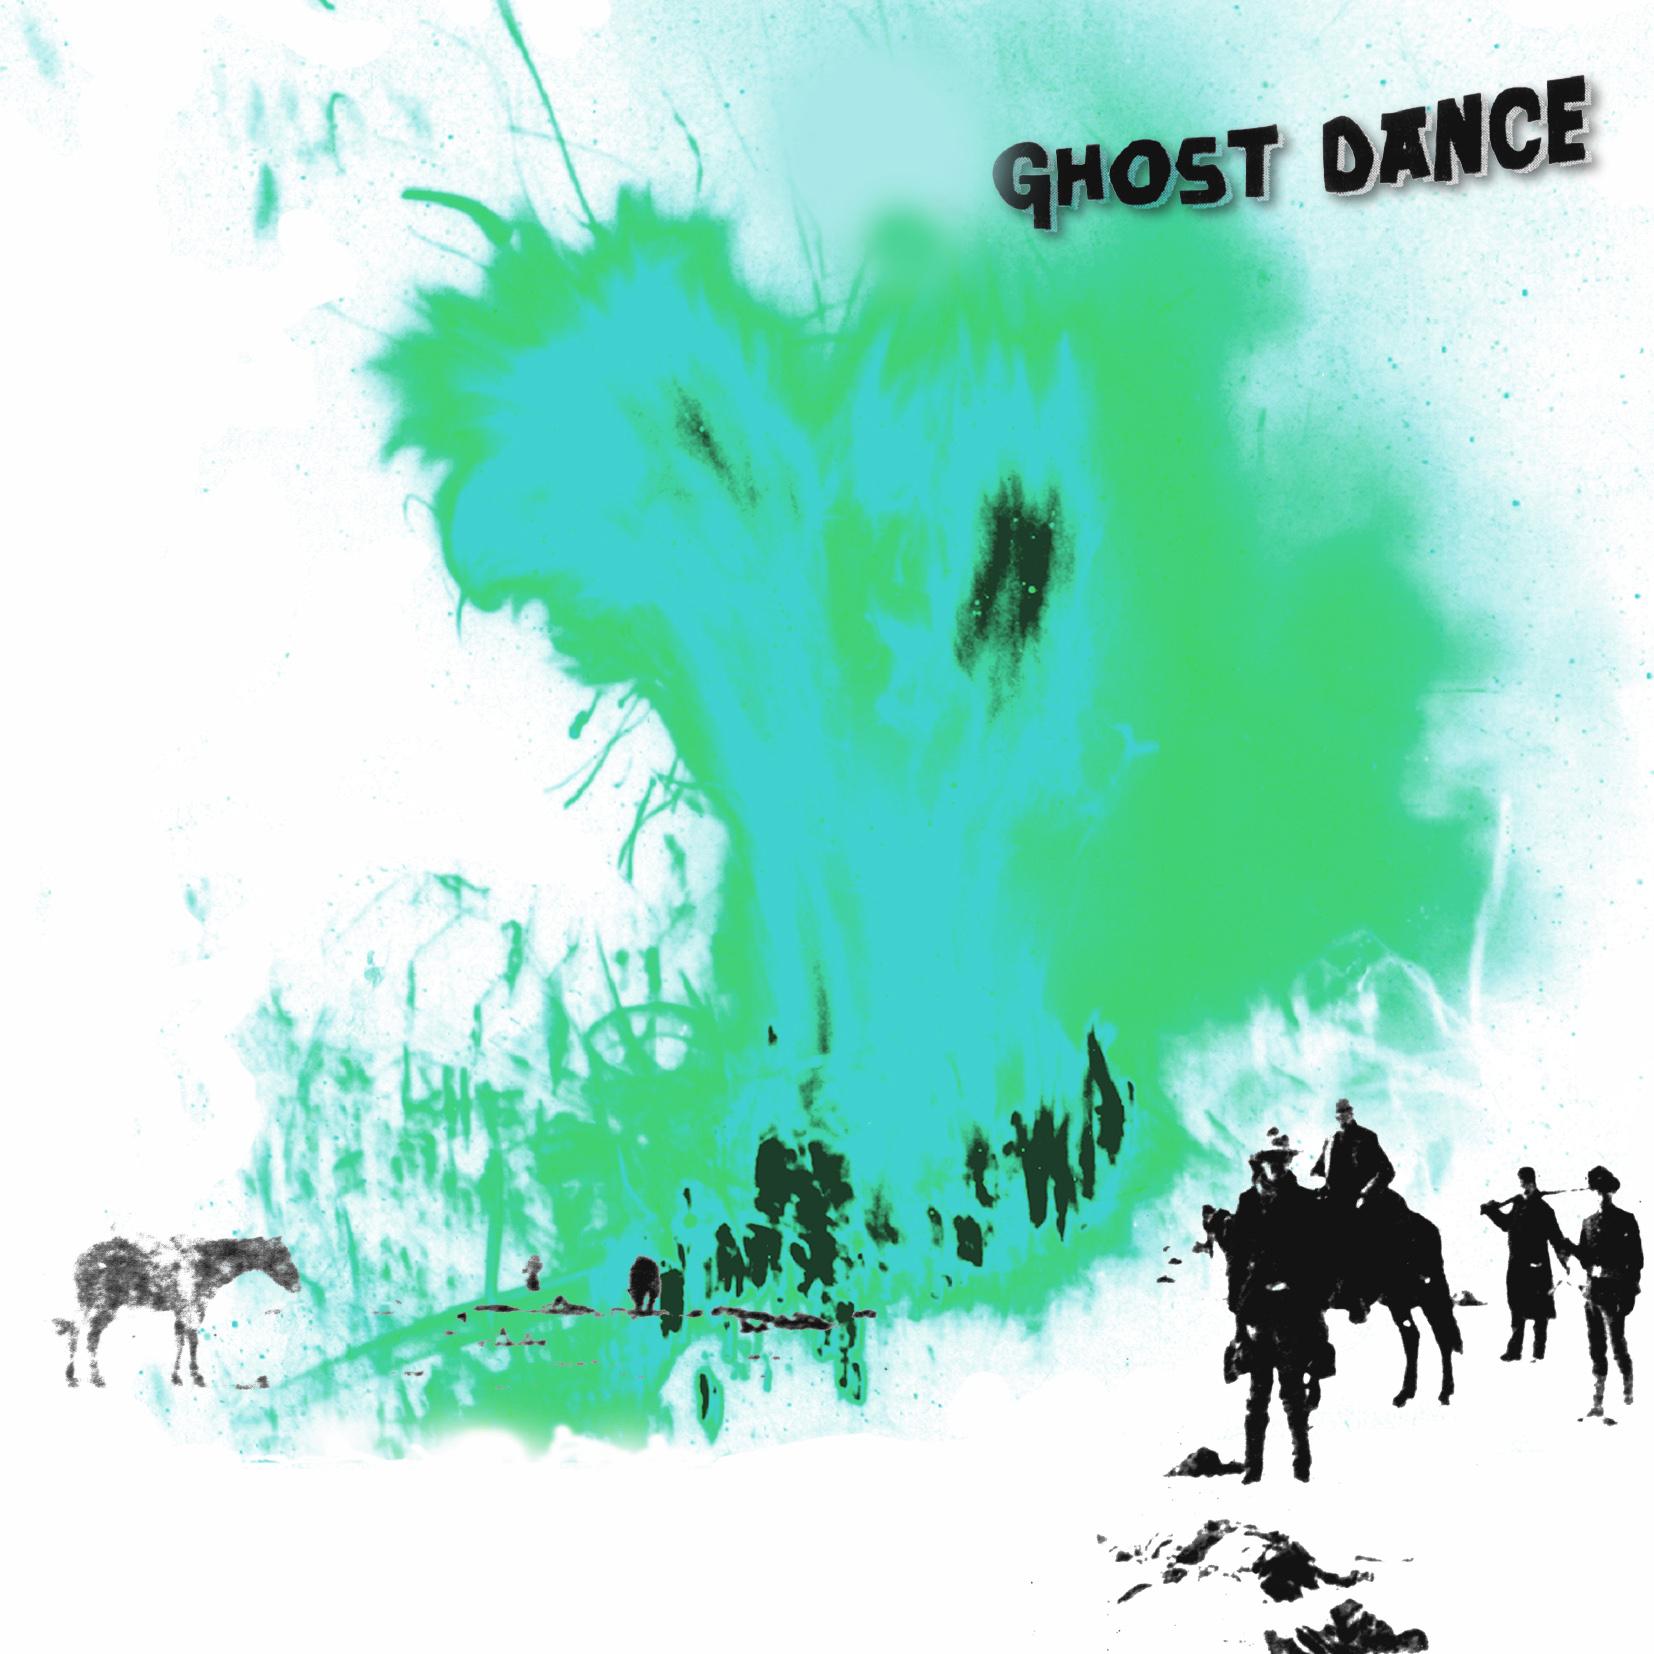 Ghost Dance artwork